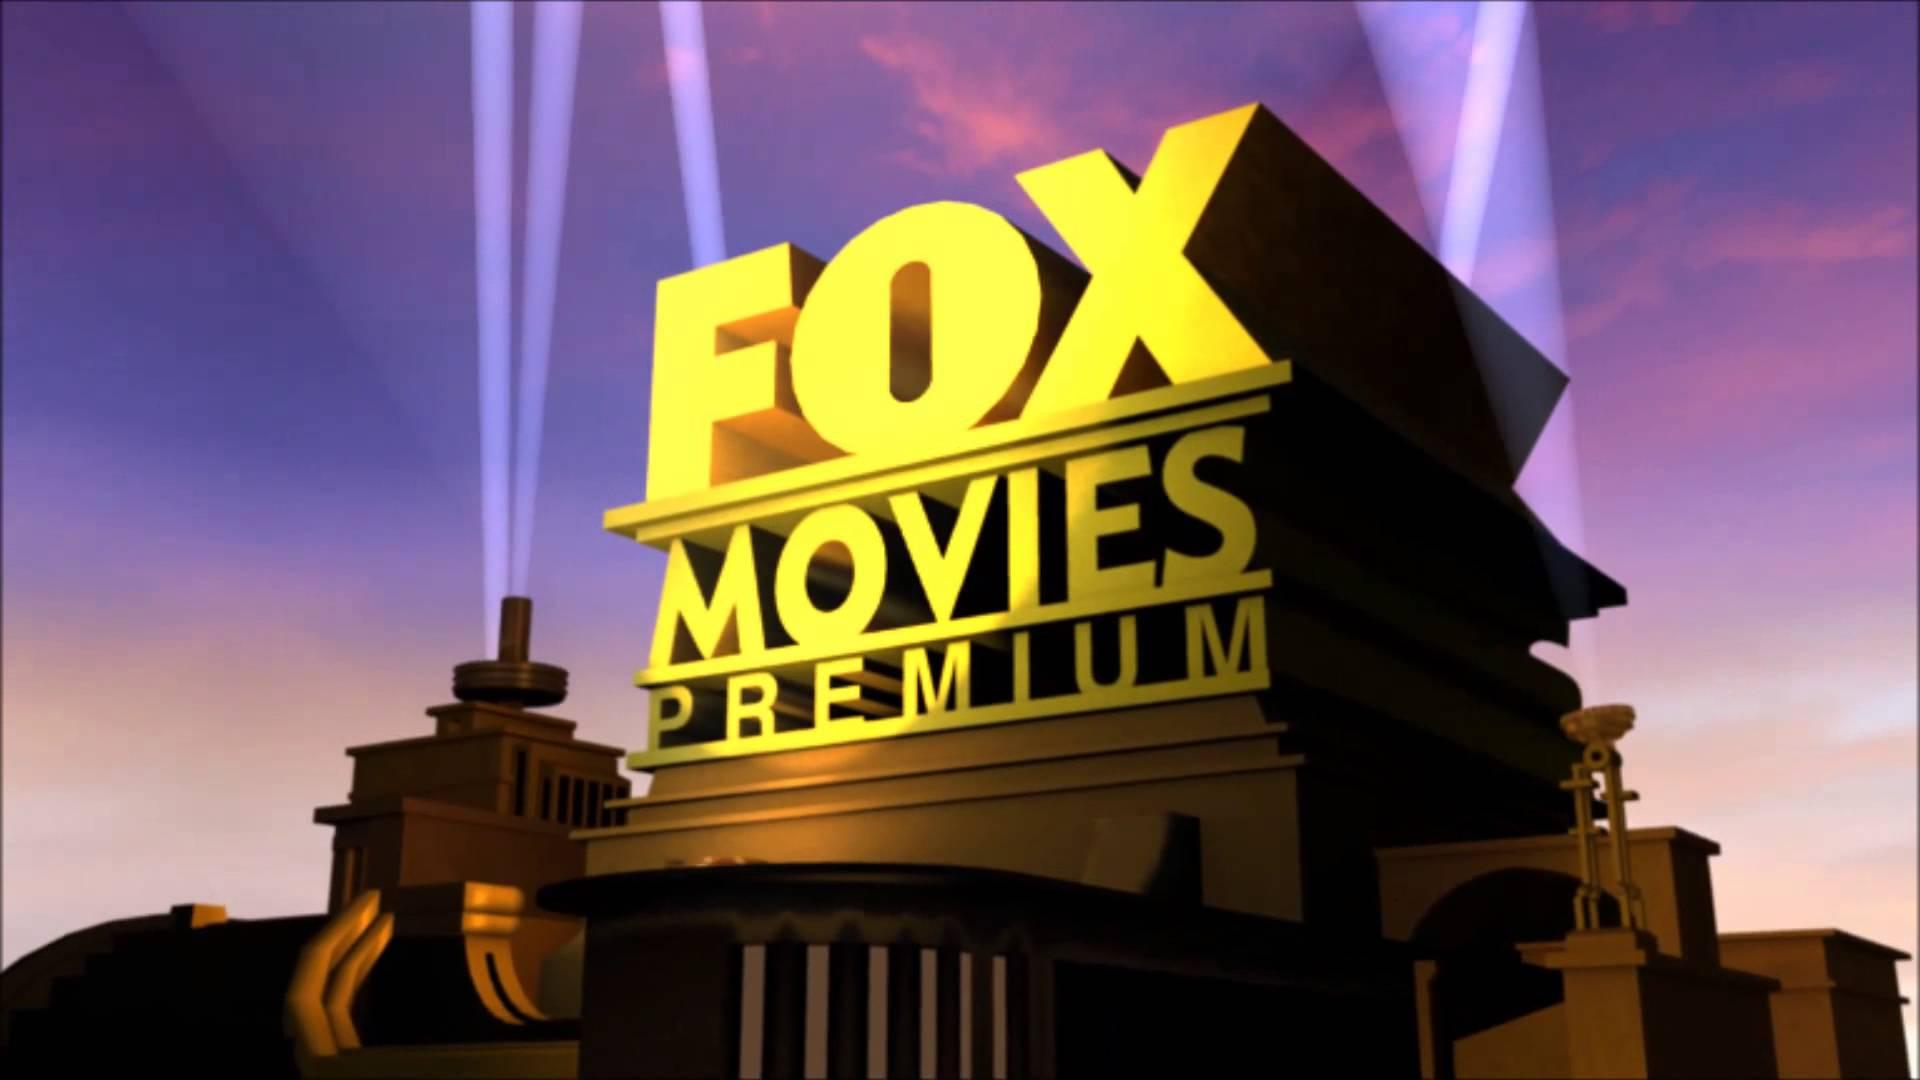 Fox movies premium Logos